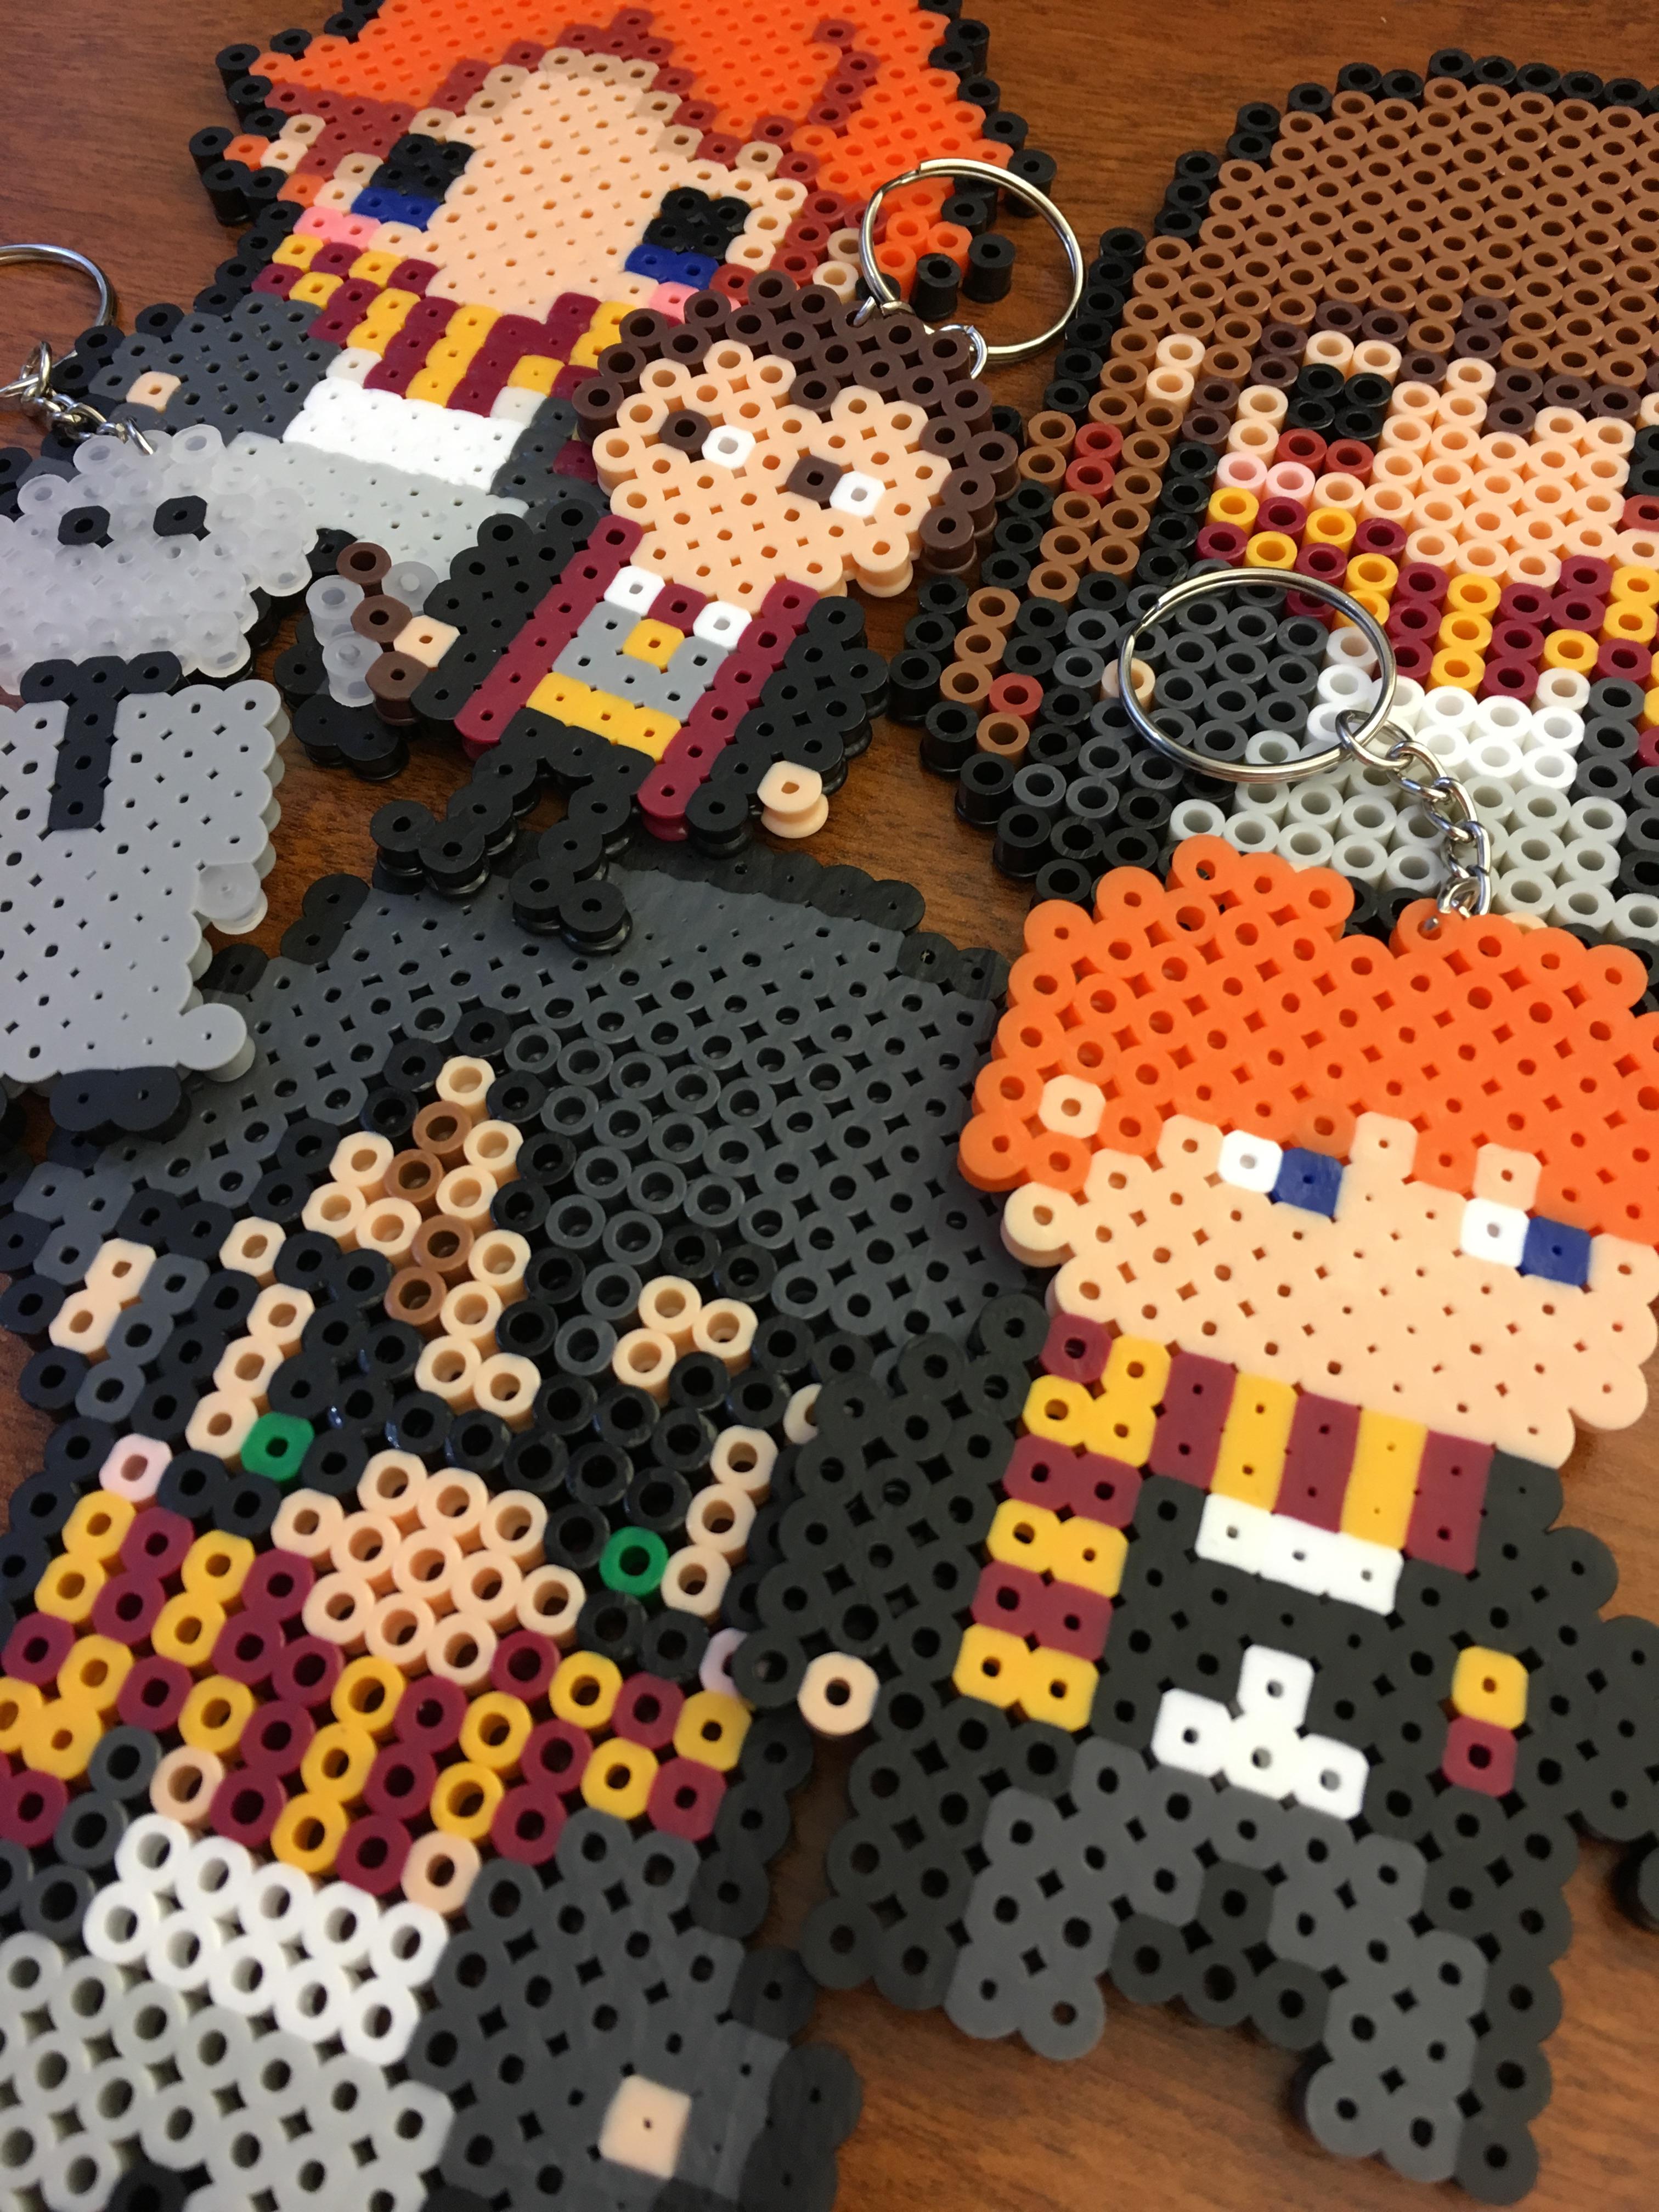 Harry Potter, Voldemort, Ron Weasle, Hermoine Granger, Neville Longbottom key chains made out of perler beads